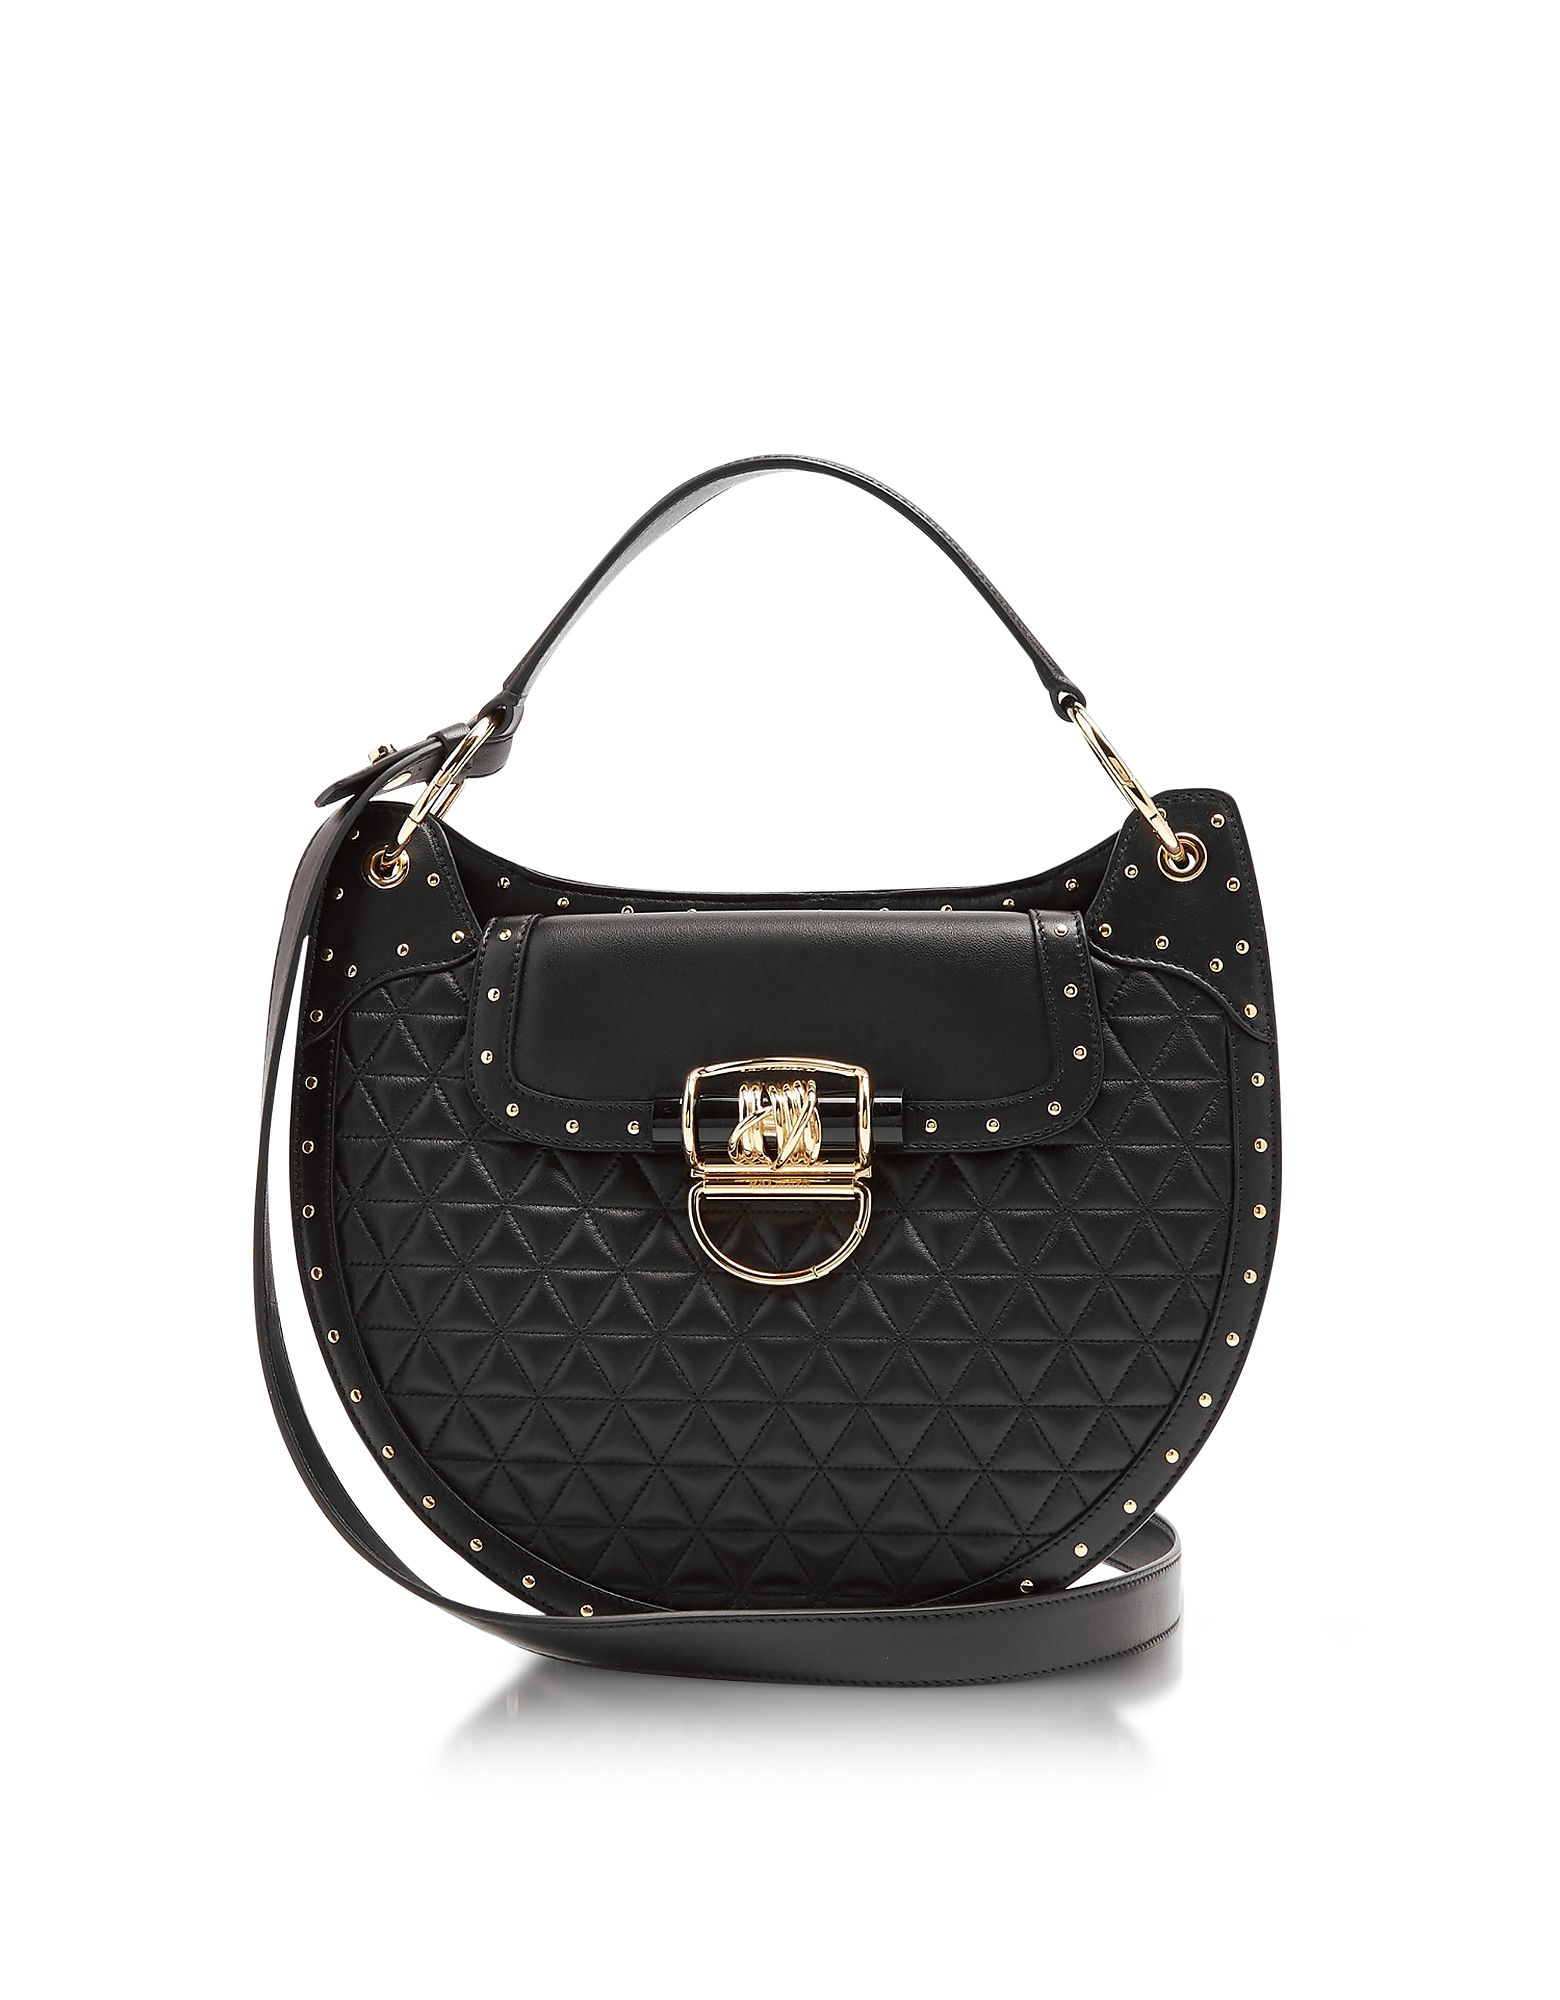 c619973b38c9 Luggage & Travel - Buy Best Luggage & Travel from Fashion Influencers    Brick & Portal